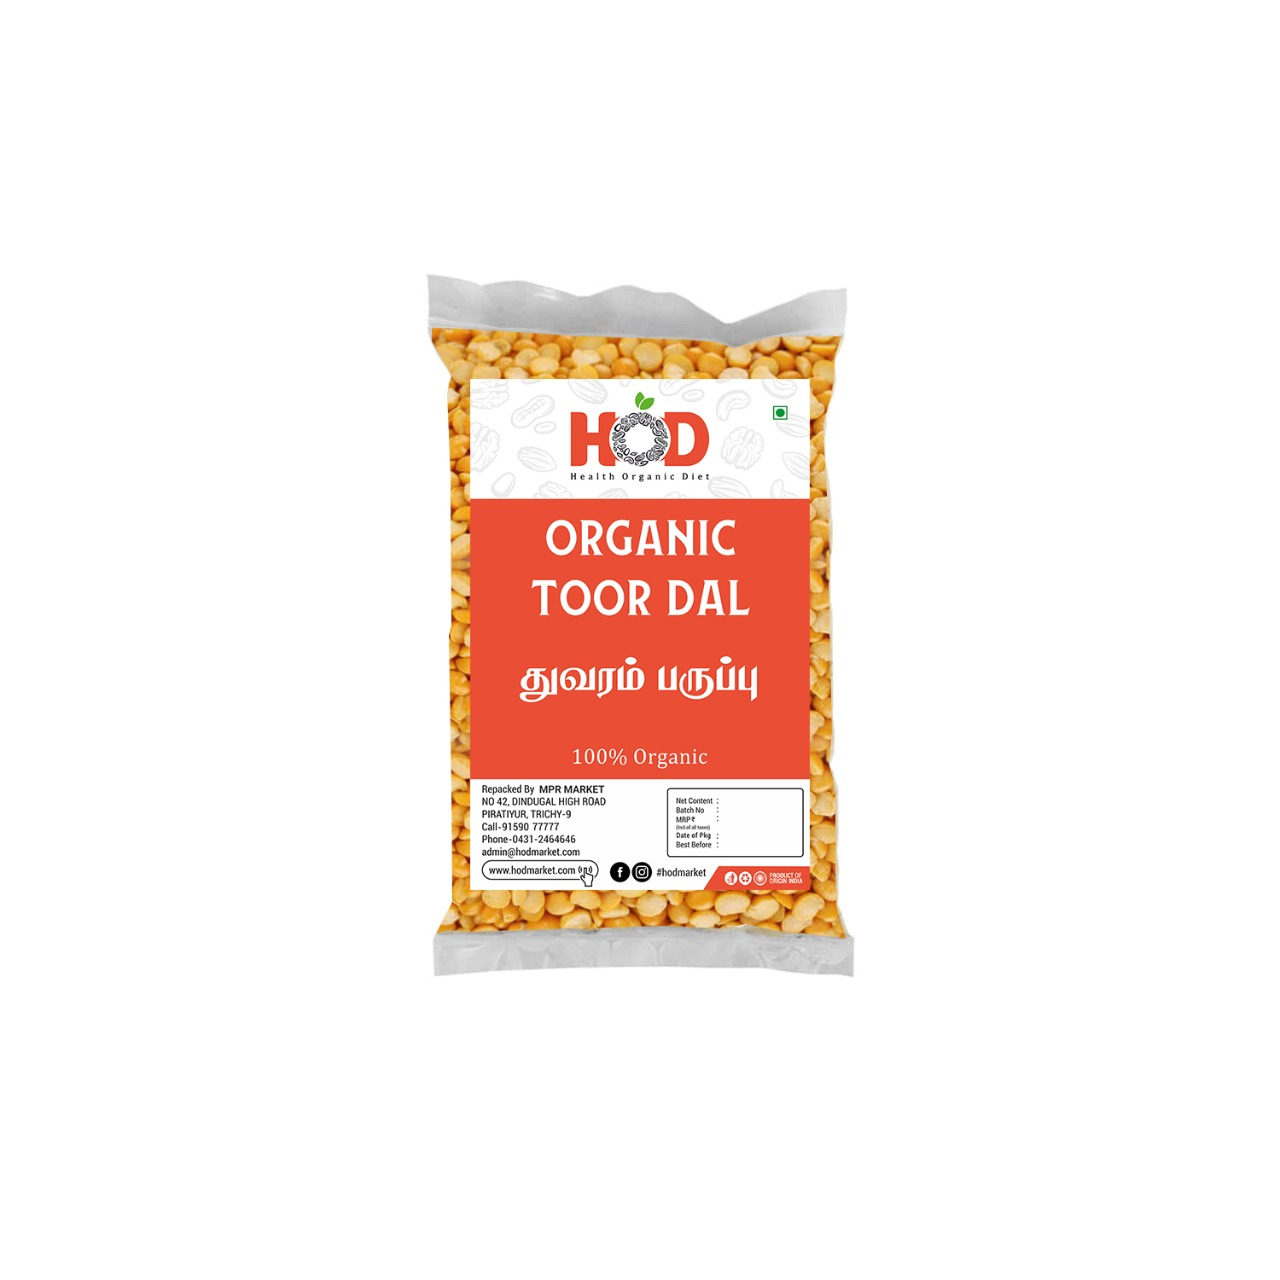 HOD- TOOR DAL/THOOVARAM PARUPU 500G